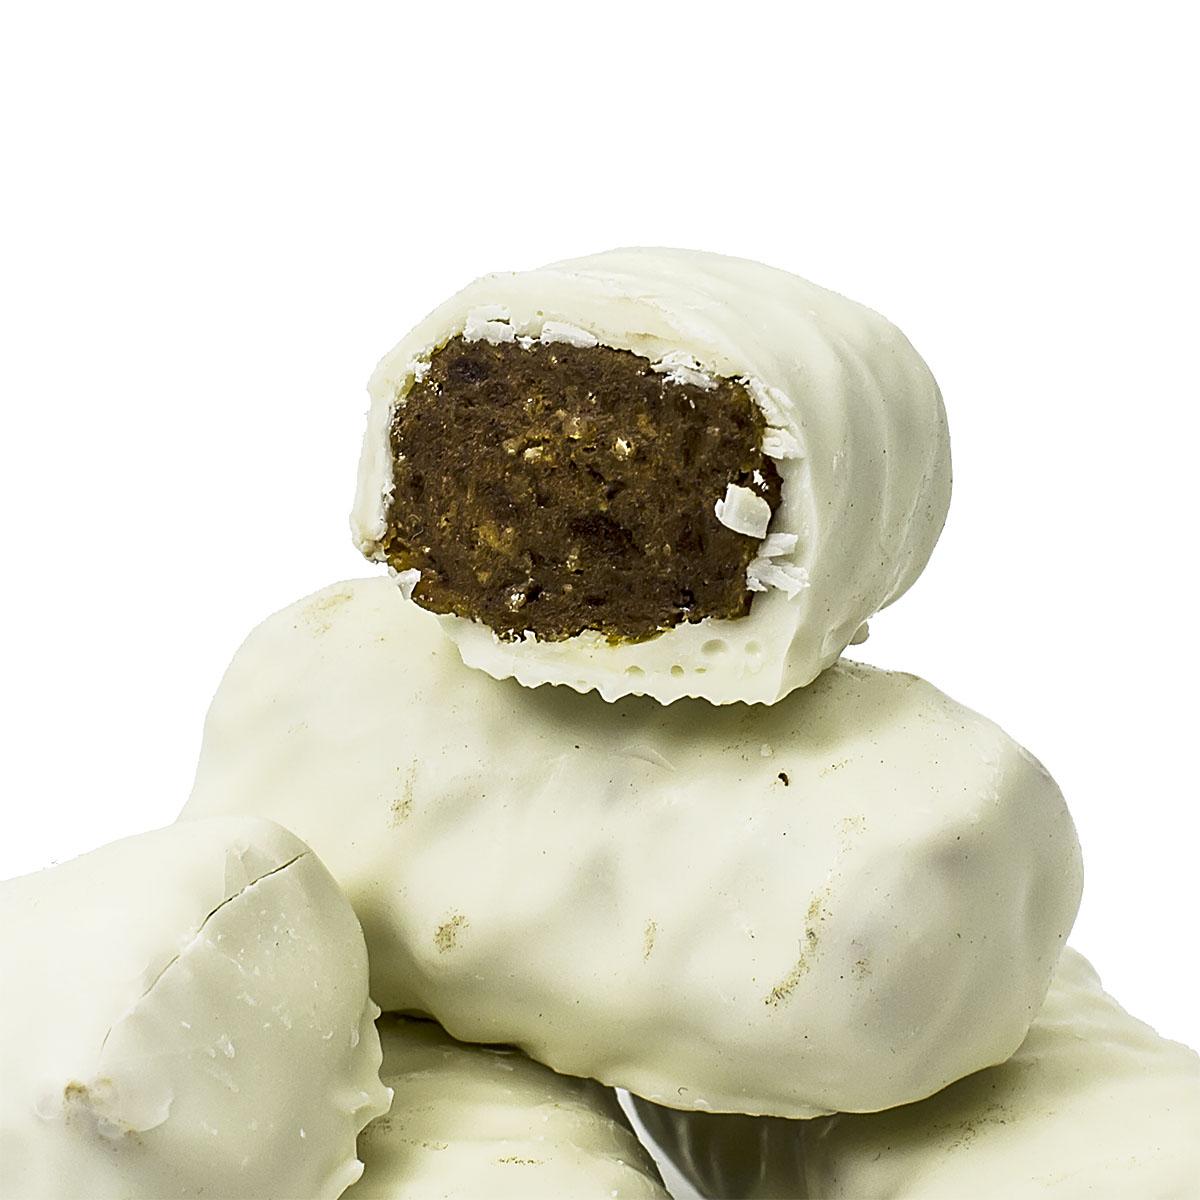 Банан в белой шоколадной глазури, 150 г kotanyi приправа сахар с какао с ароматом рома 45 г